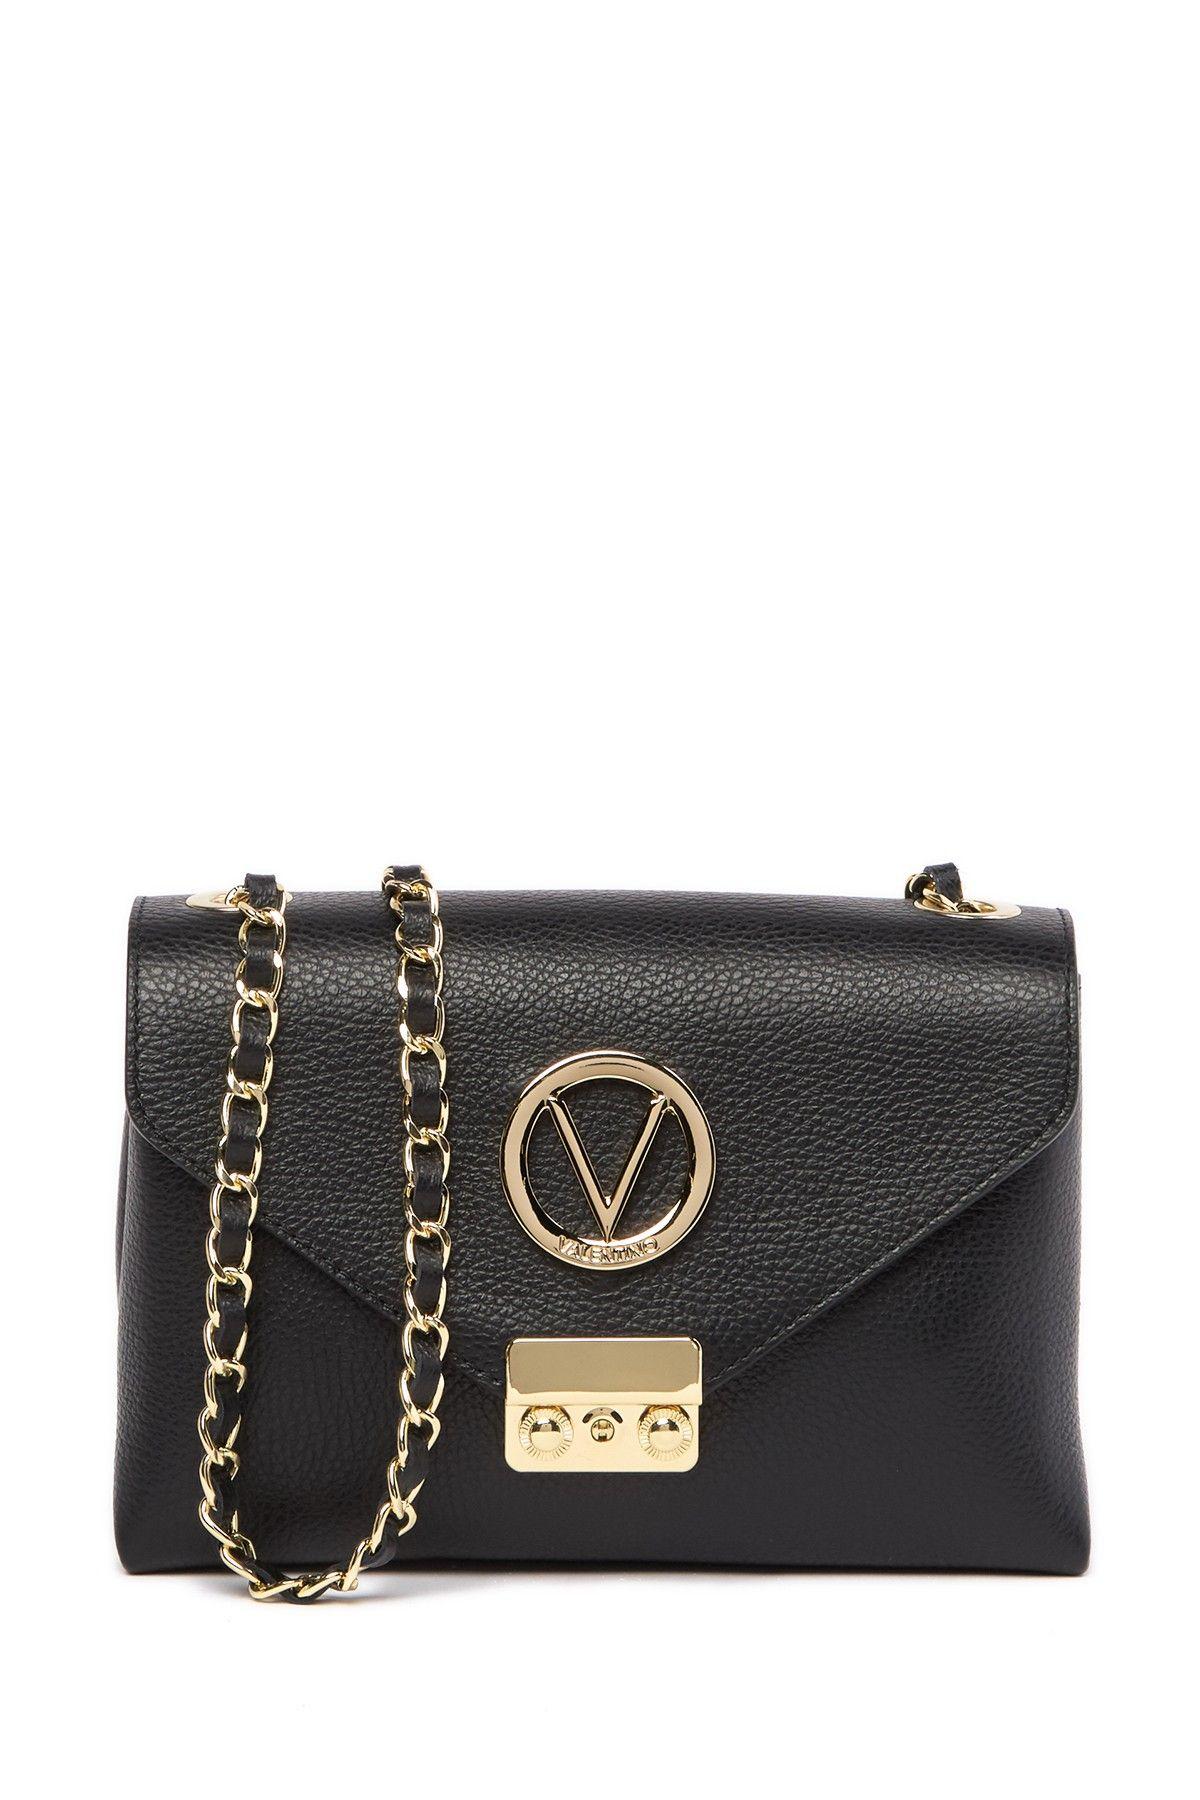 Valentino By Mario Valentino Isabelle Leather Crossbody Bag Crossbody Bag Valentino Crossbody Leather Crossbody